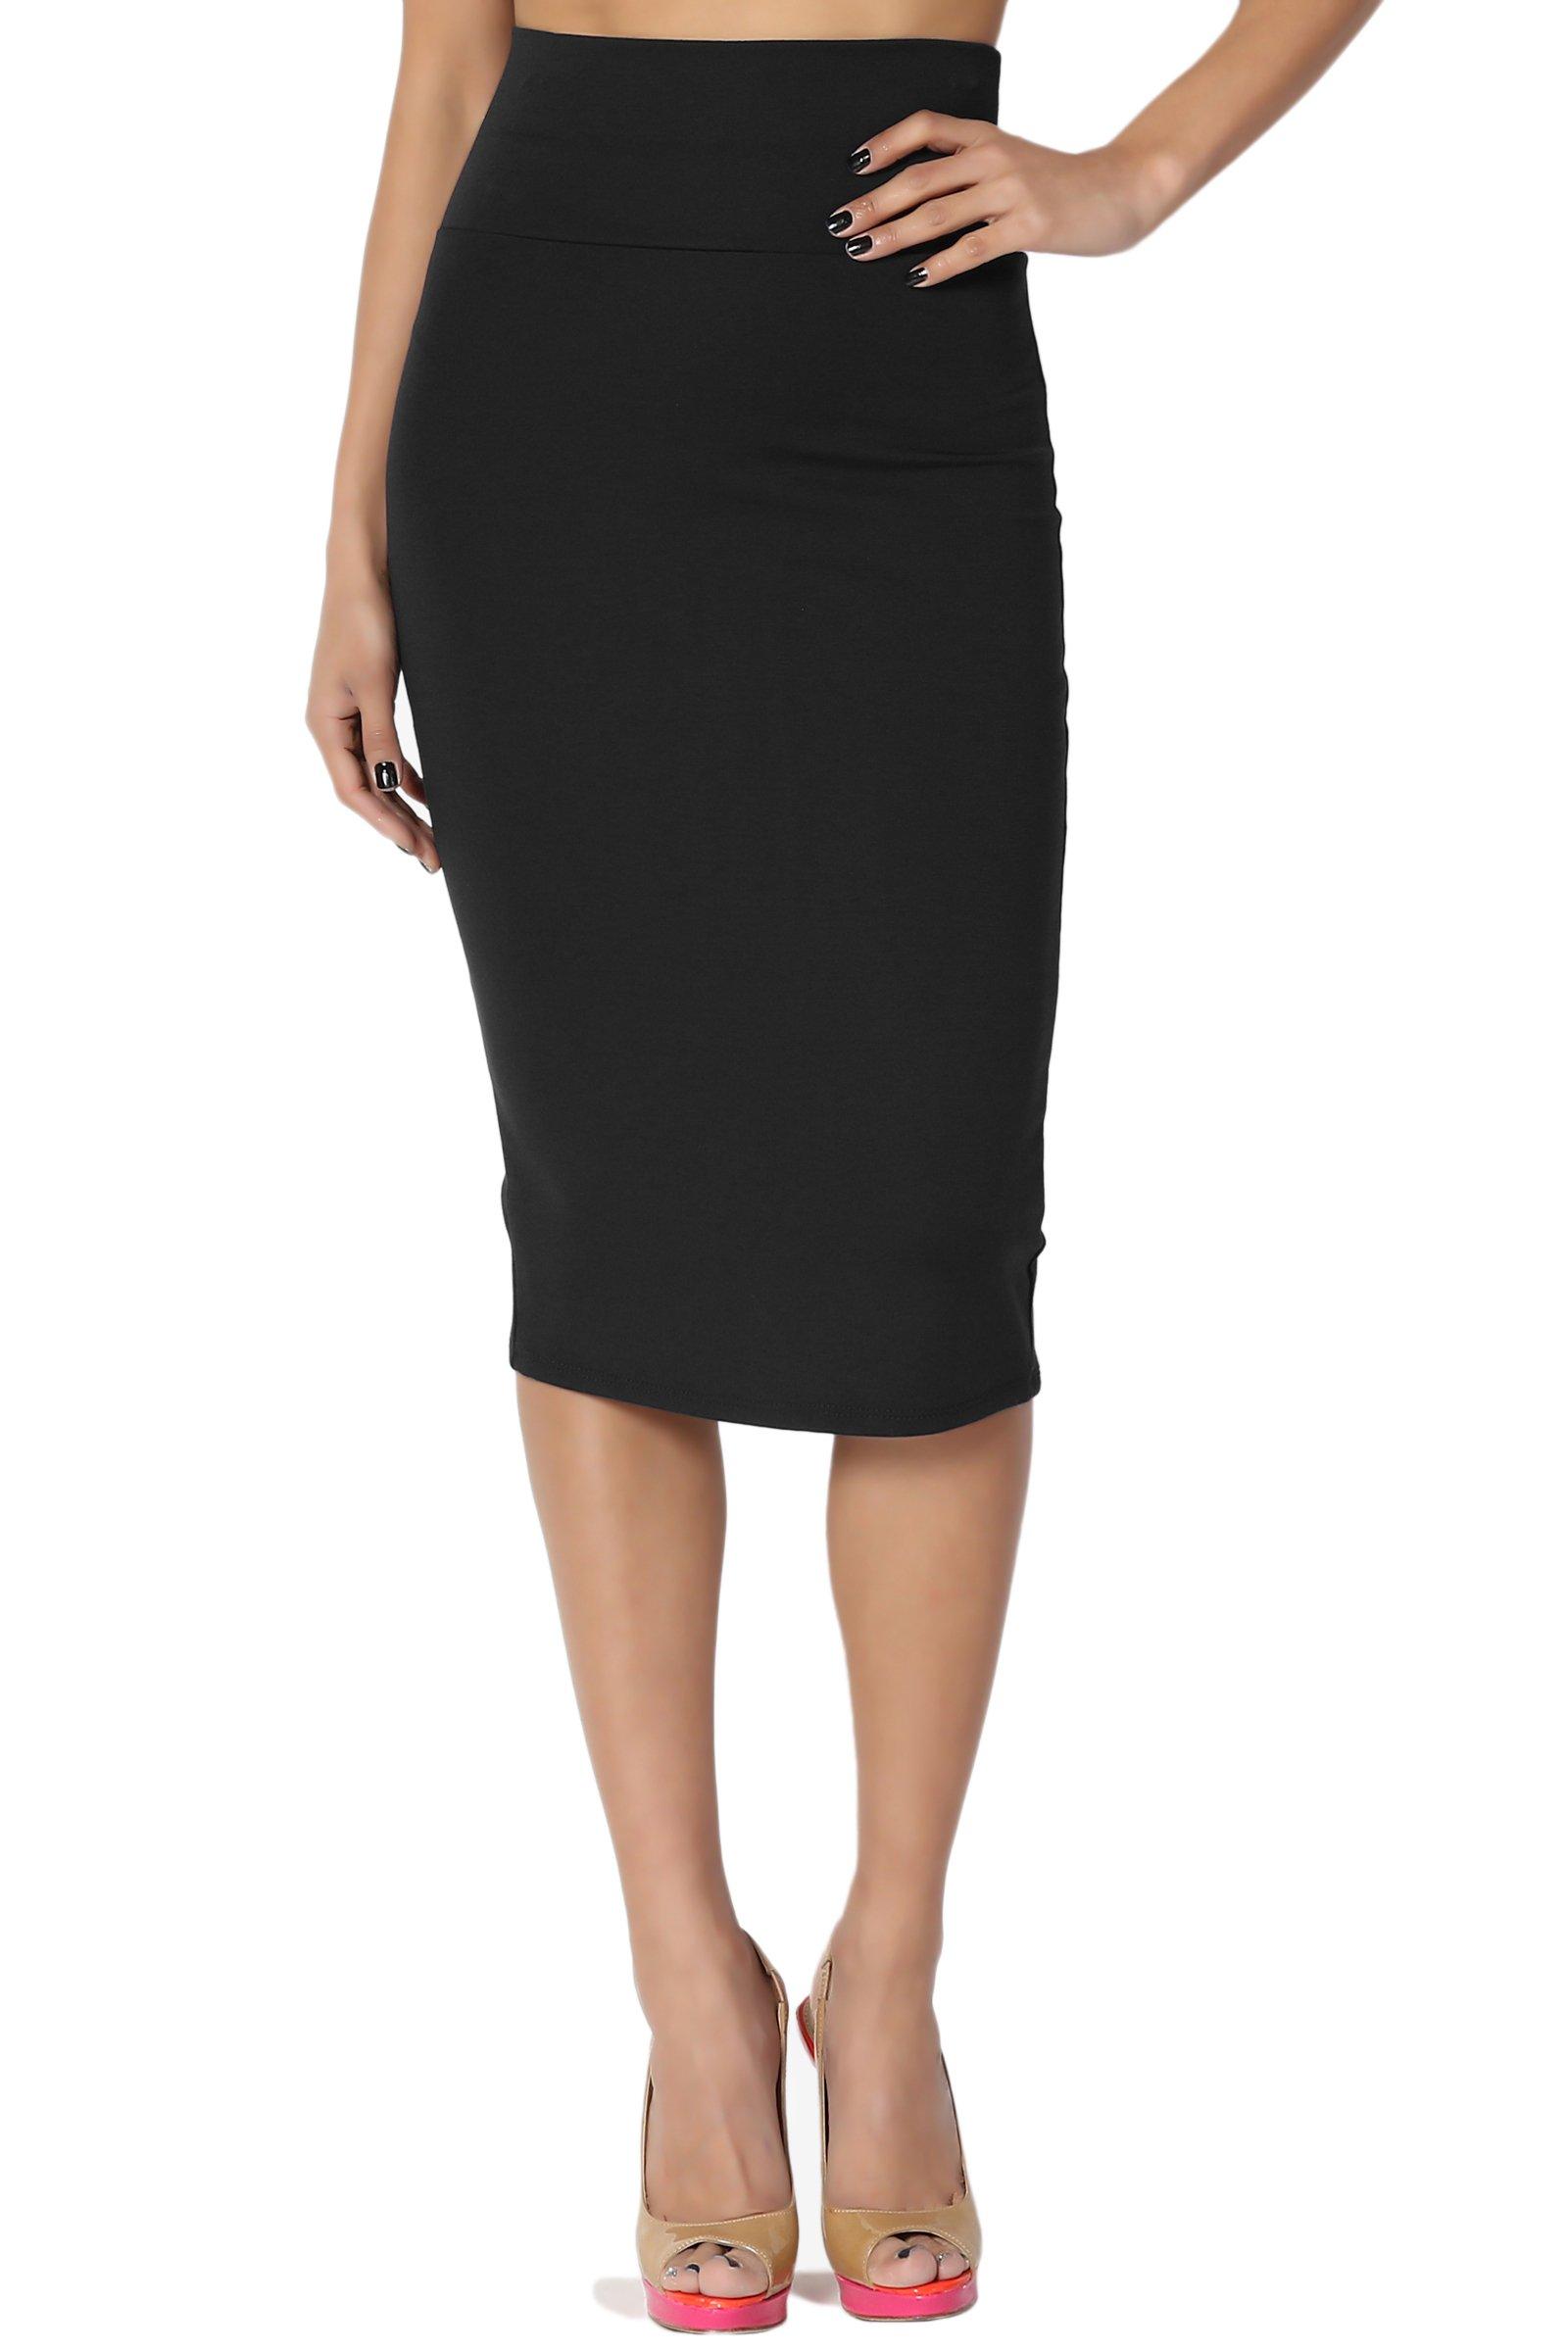 TheMogan Women's High Waisted Pull On Stretch Ponte Midi Pencil Skirt Black XL